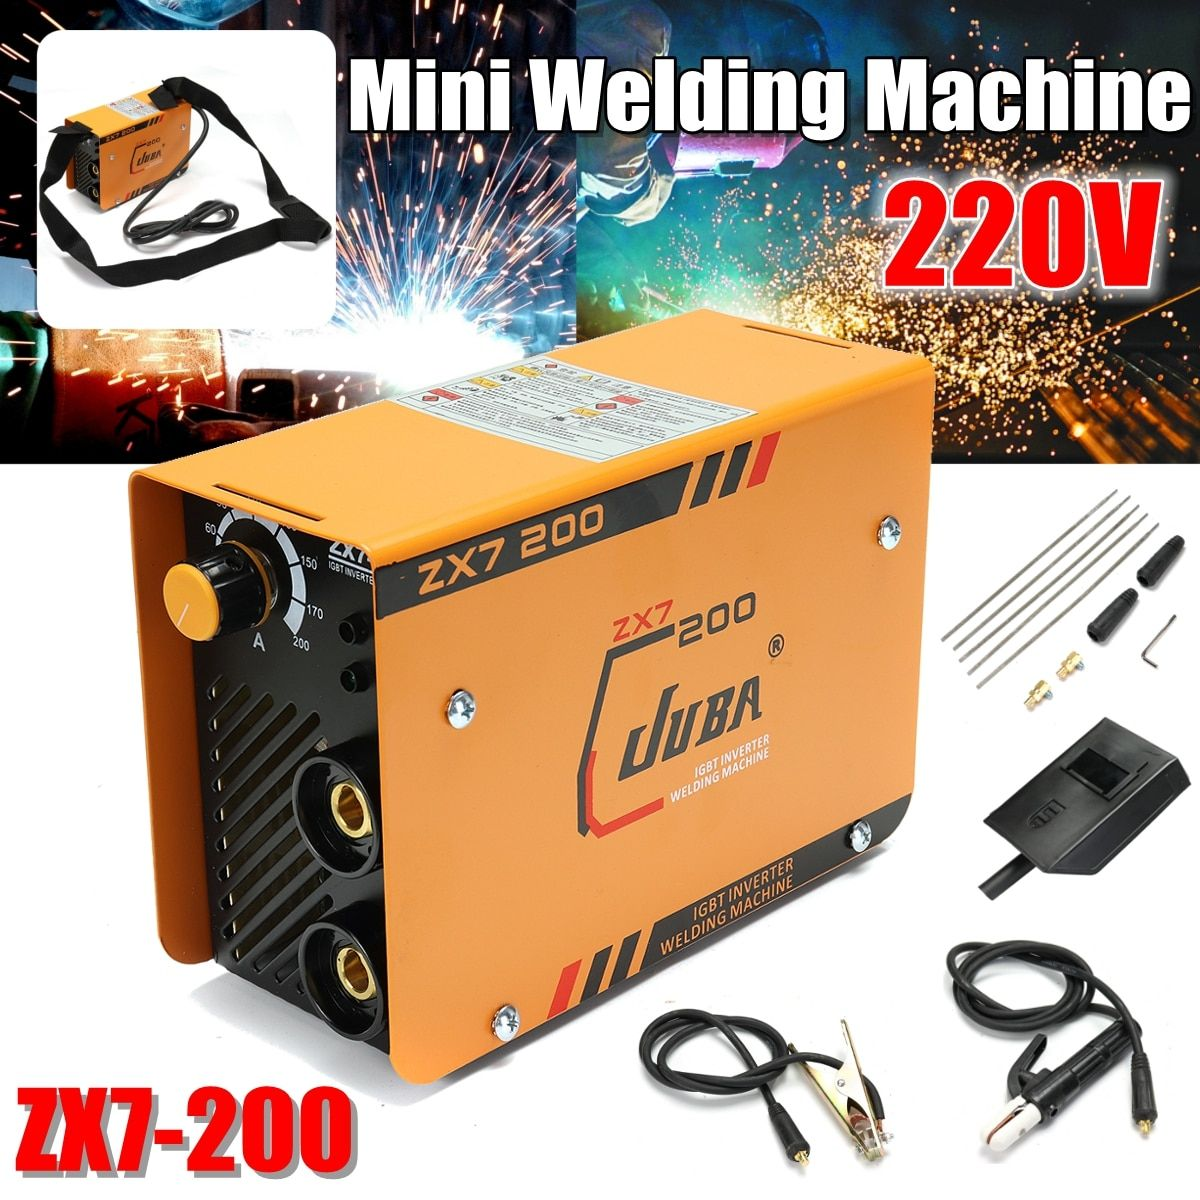 Mini 220V Inverter AC Arc Welding Machine zx7-200 MMA W elder for Soldering Welding Working and Electric Working